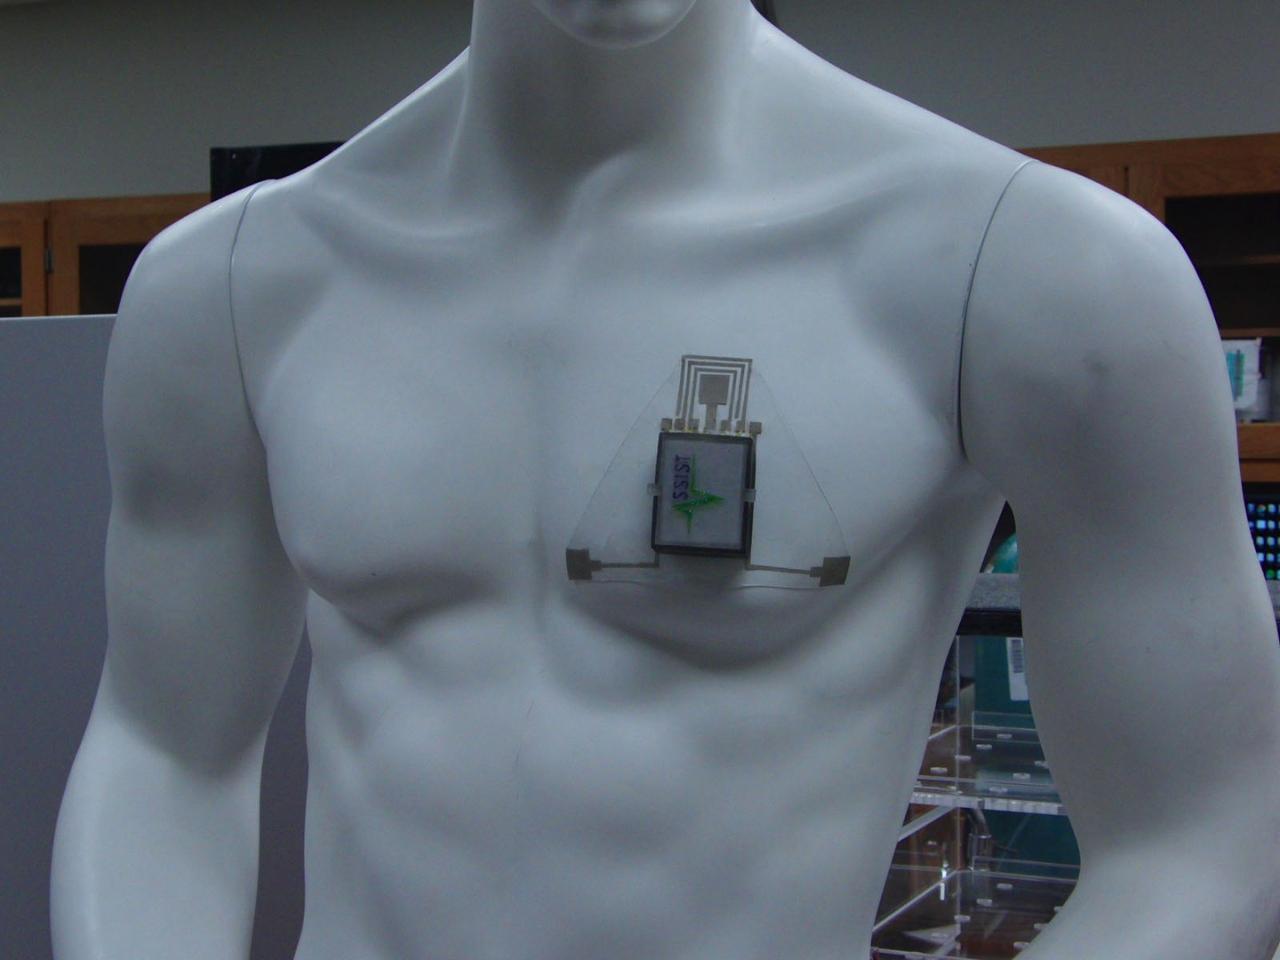 A prototype HET chest patch